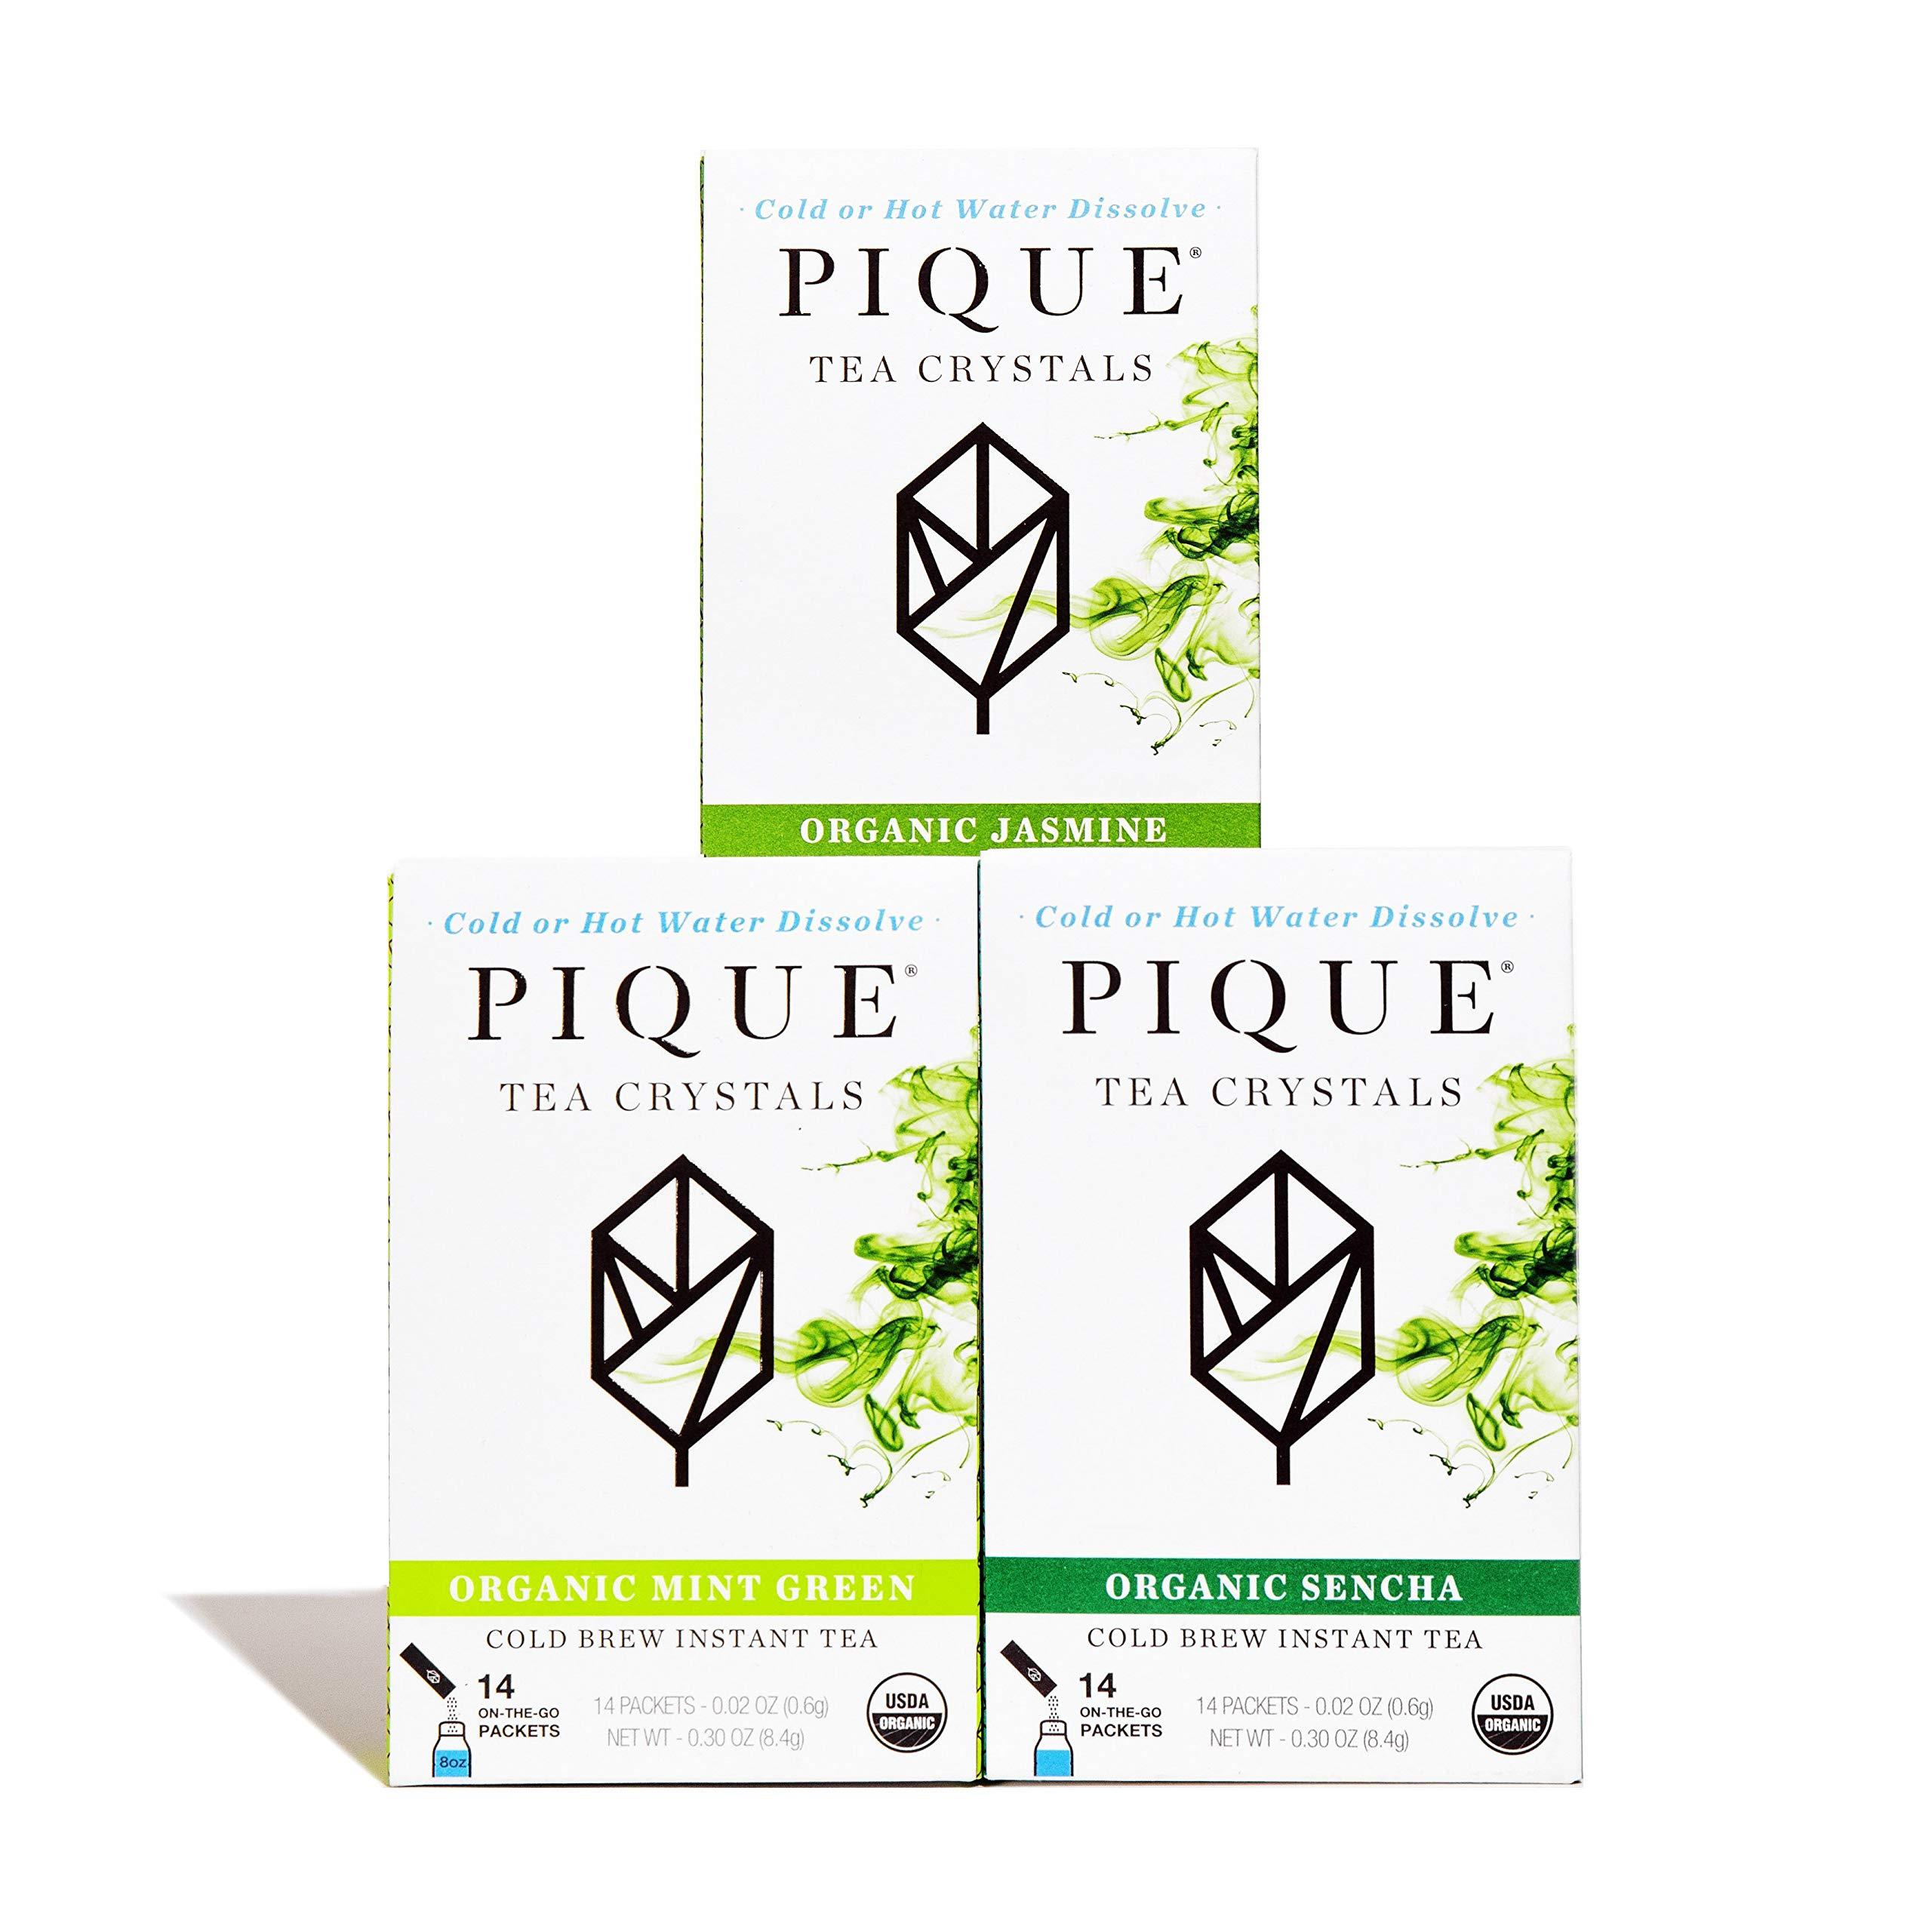 Pique Tea Organic Green Tea Crystals Sampler - Gut Health, Fasting, Calm - 42 Single Serve Sticks (Pack of 3) by PIQUE